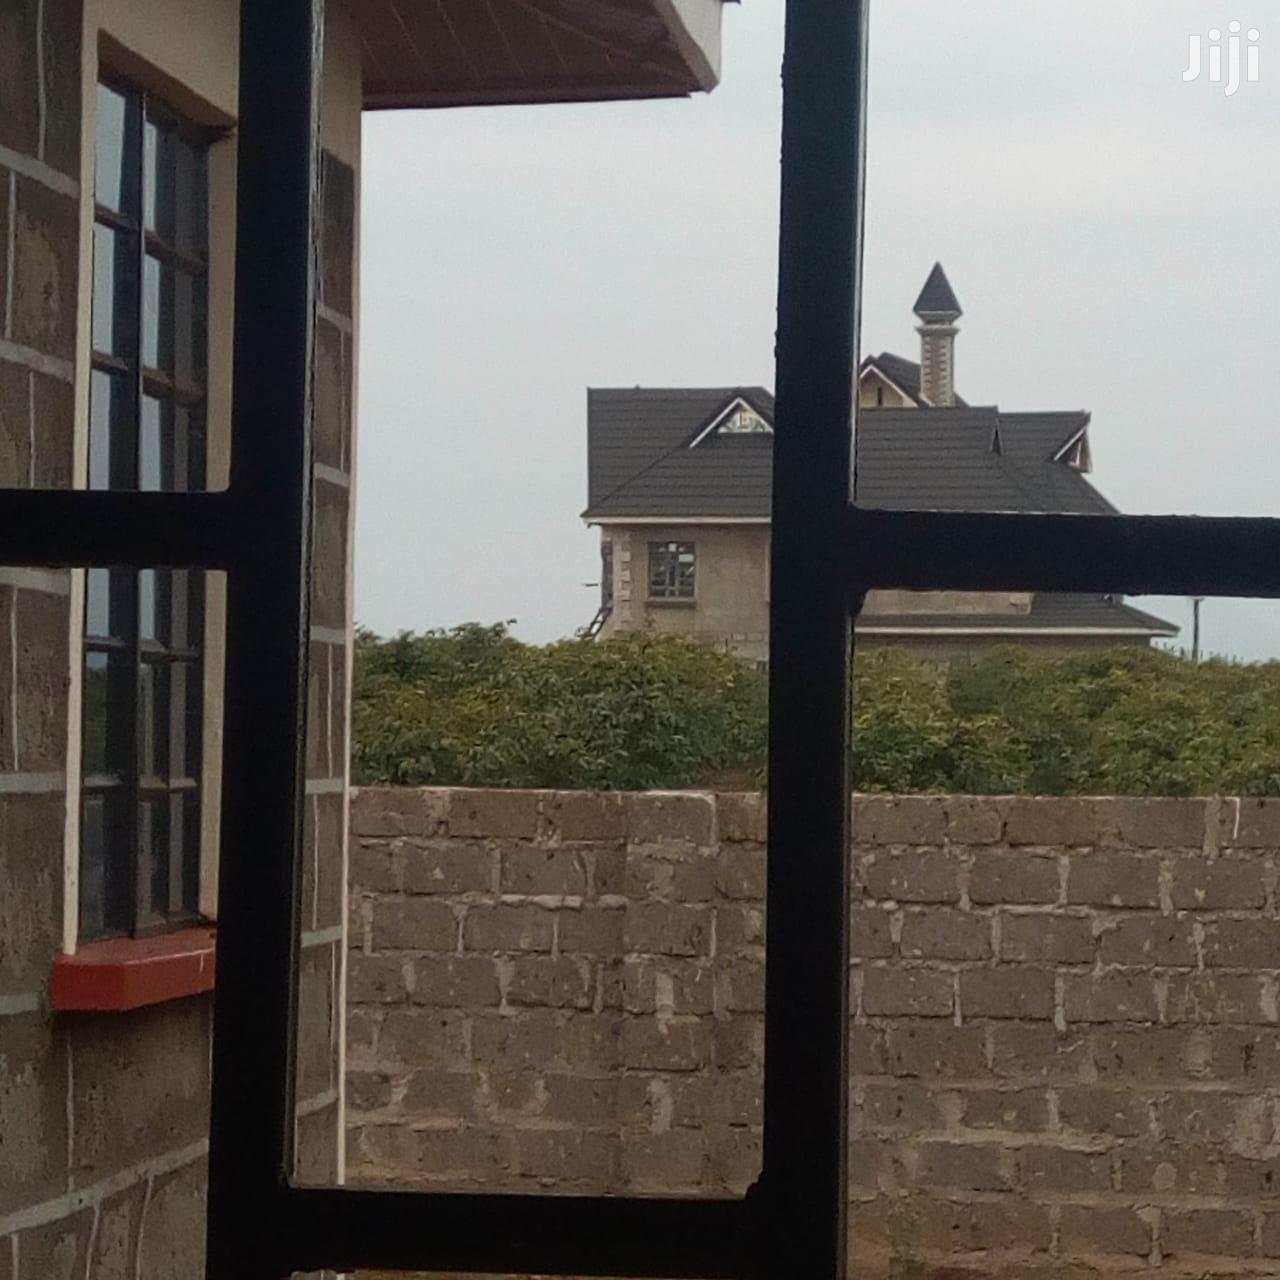 Archive: 3 Bedroom House Gamerock, Muhasibu, Nyeri Near Le Pristine Hotel